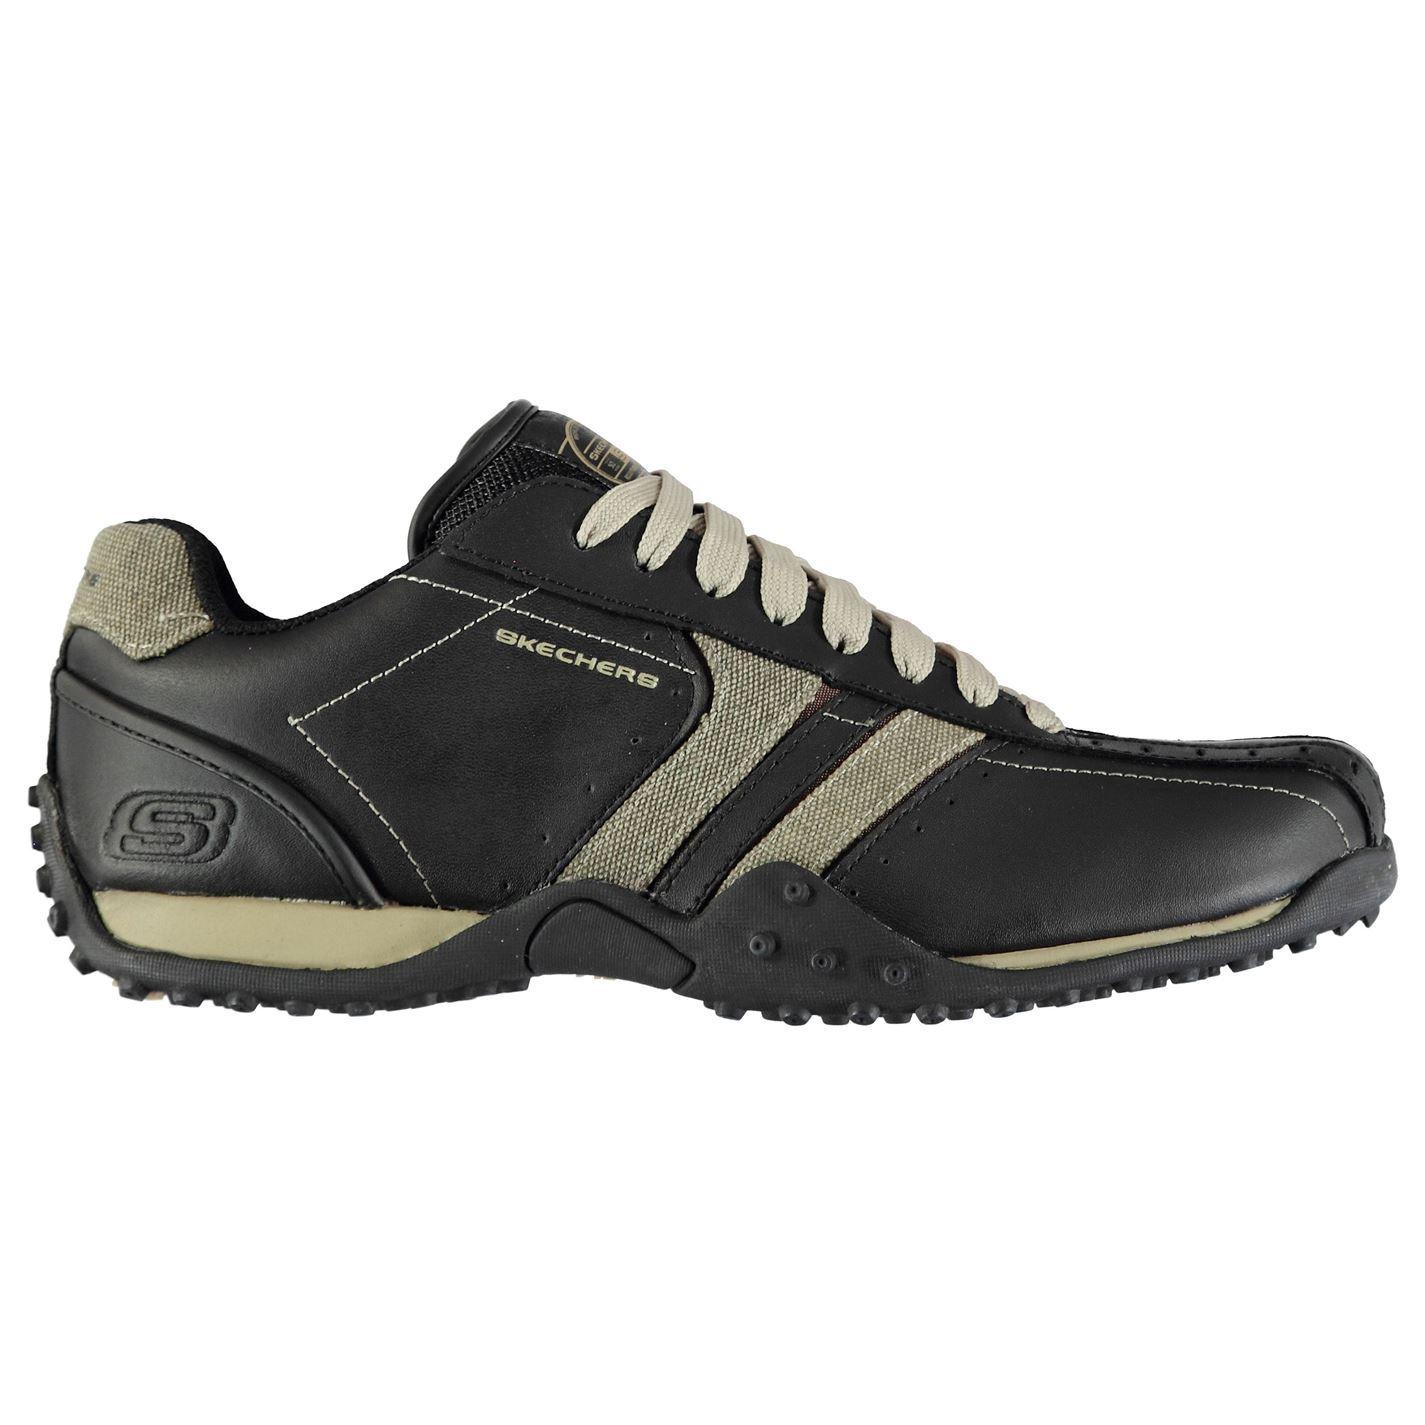 Skechers-Urban-Track-Forward-Trainers-Mens-Athleisure-Footwear-Shoes-Sneakers thumbnail 13